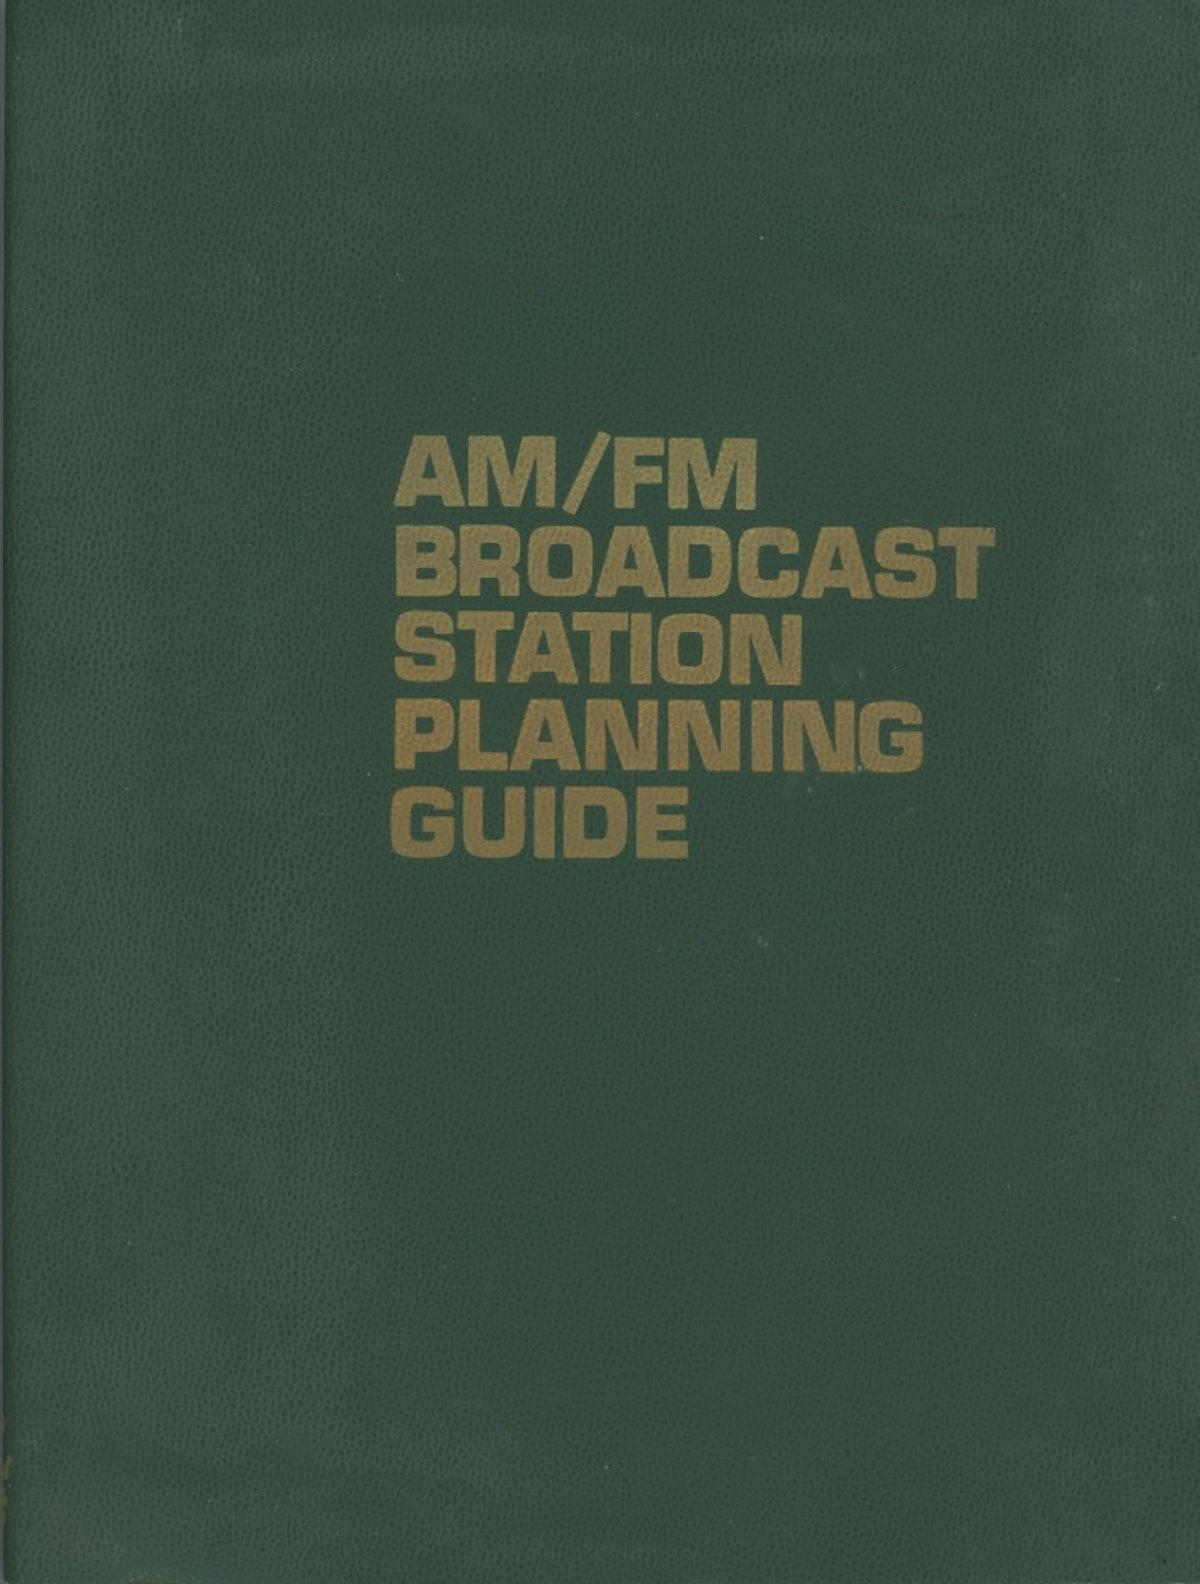 AM/FM Broadcast Station Planning Guide